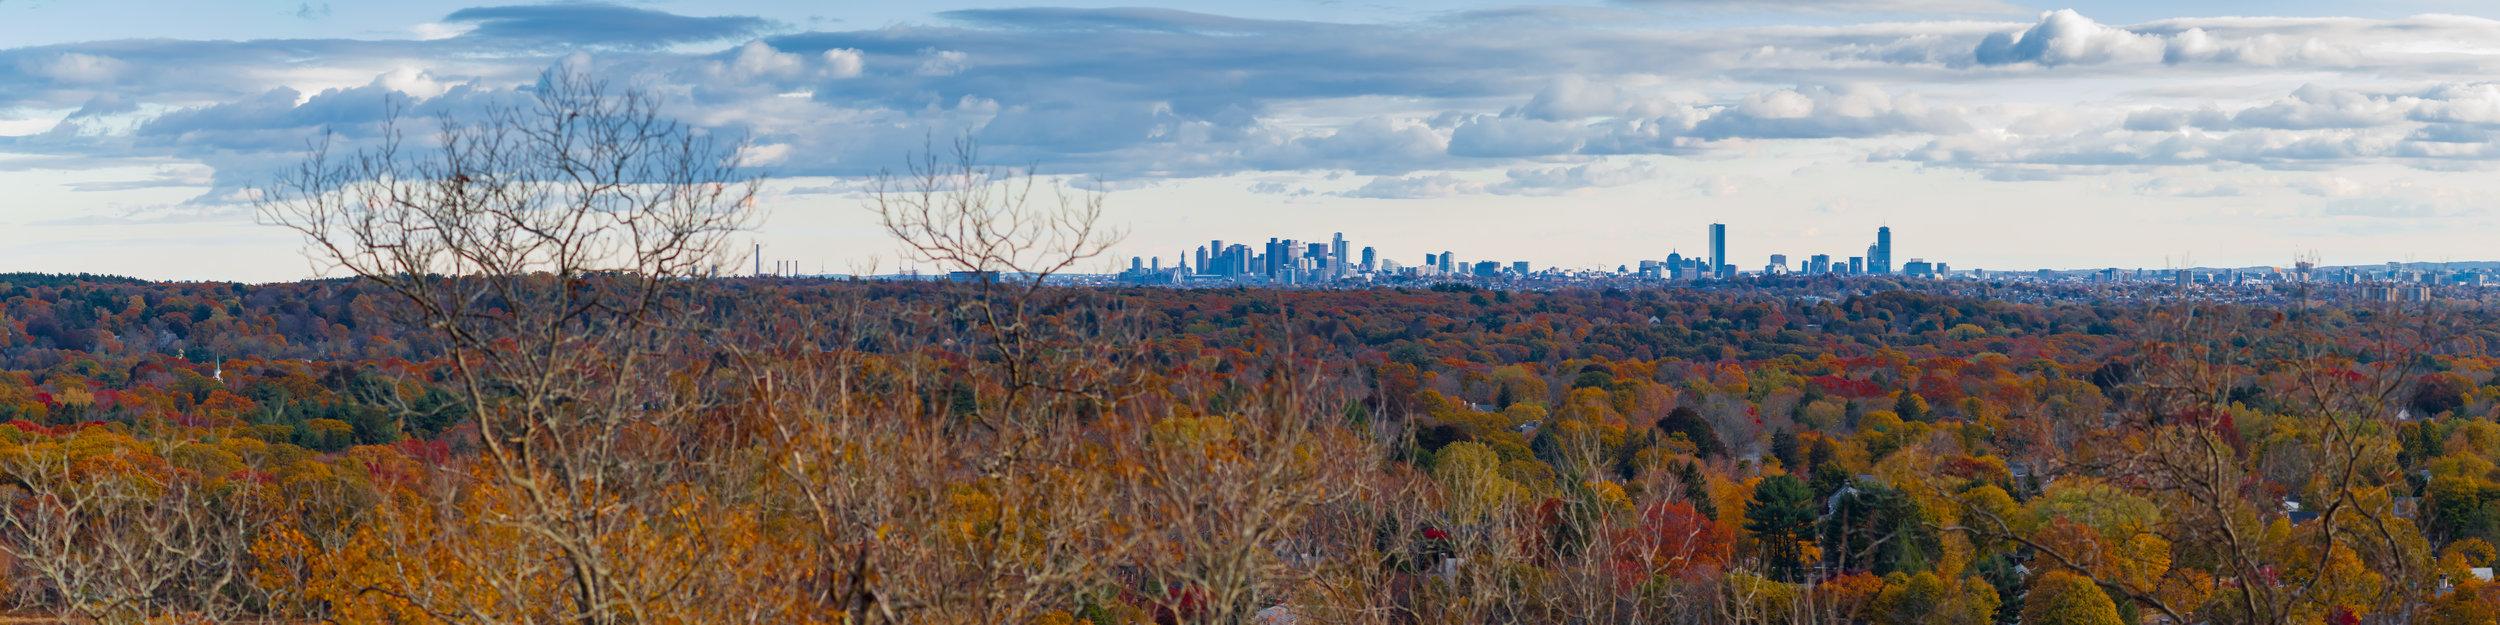 November Landscape-3.jpg